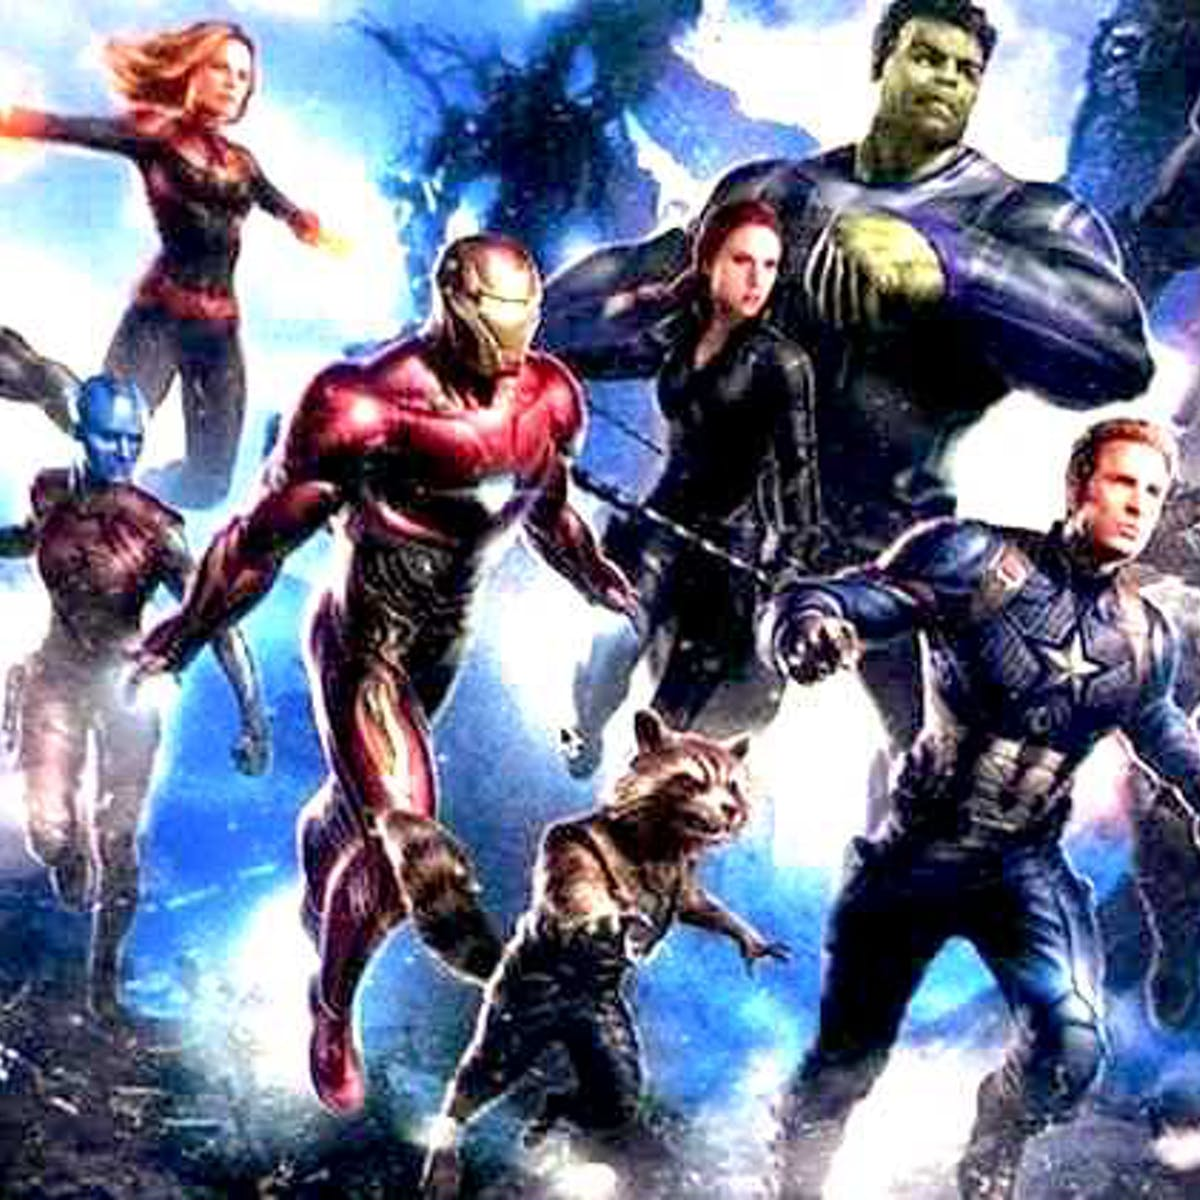 Avengers 4' Trailer Leak Teases a Moody Reunion, November